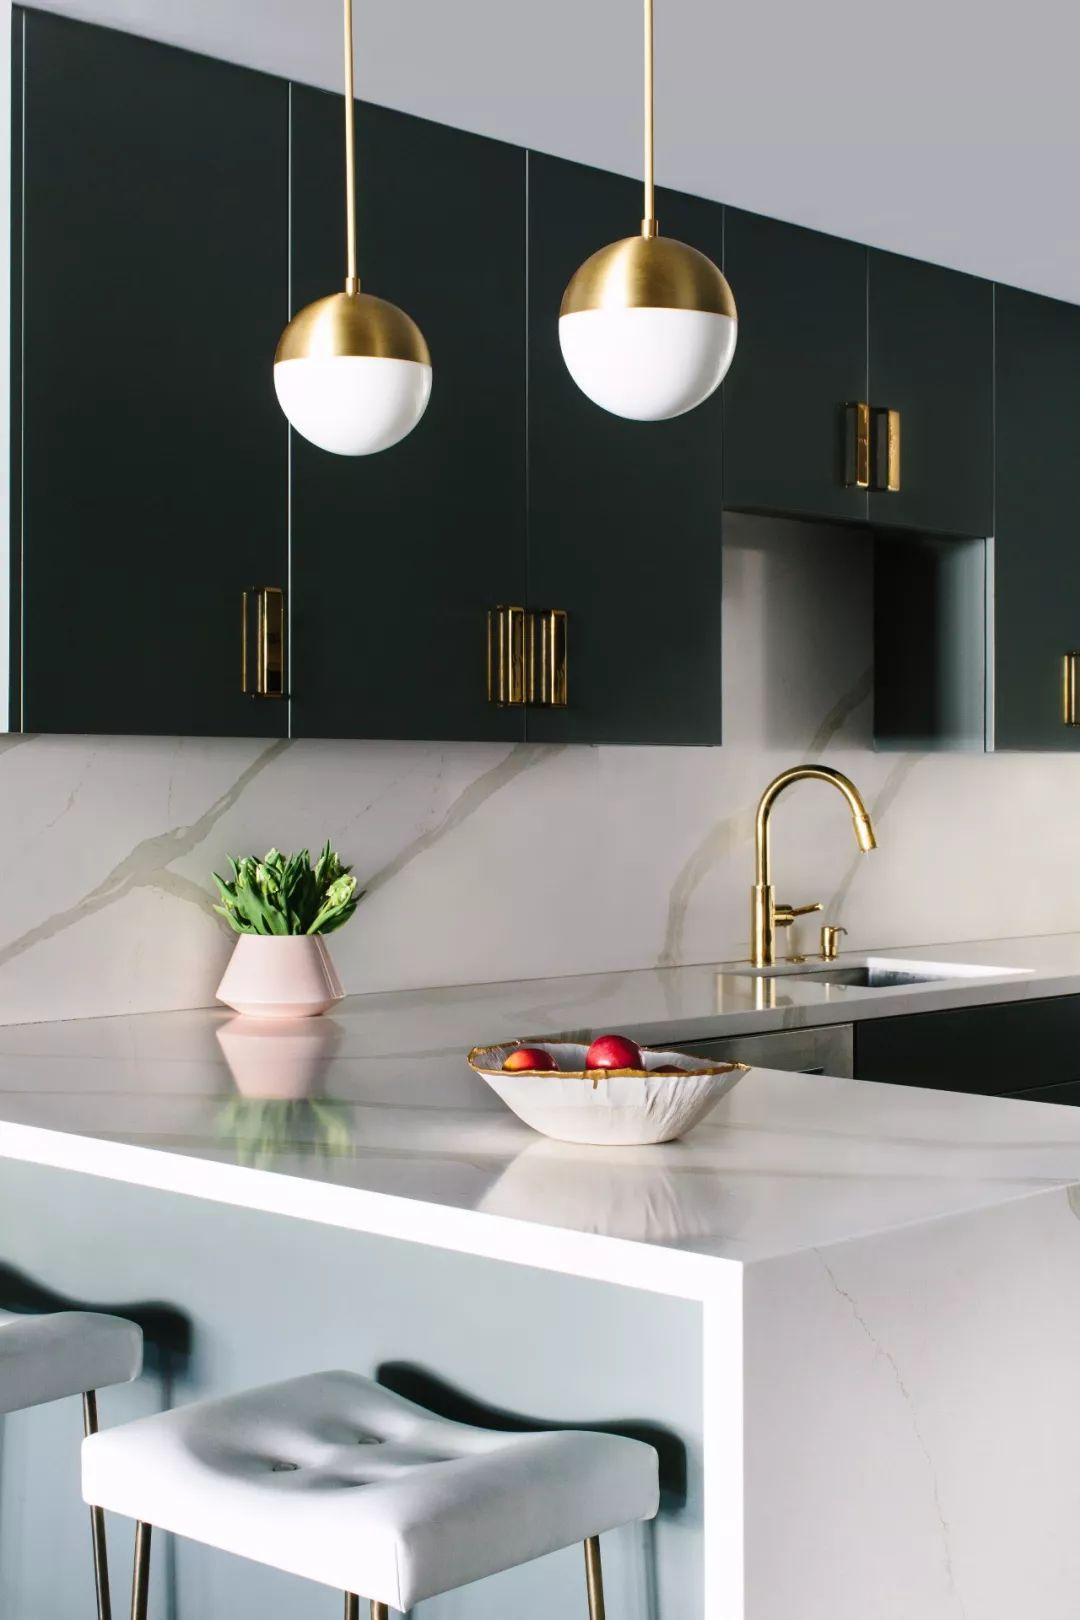 Black Lacquer | 舒适,迷人和清新的美学